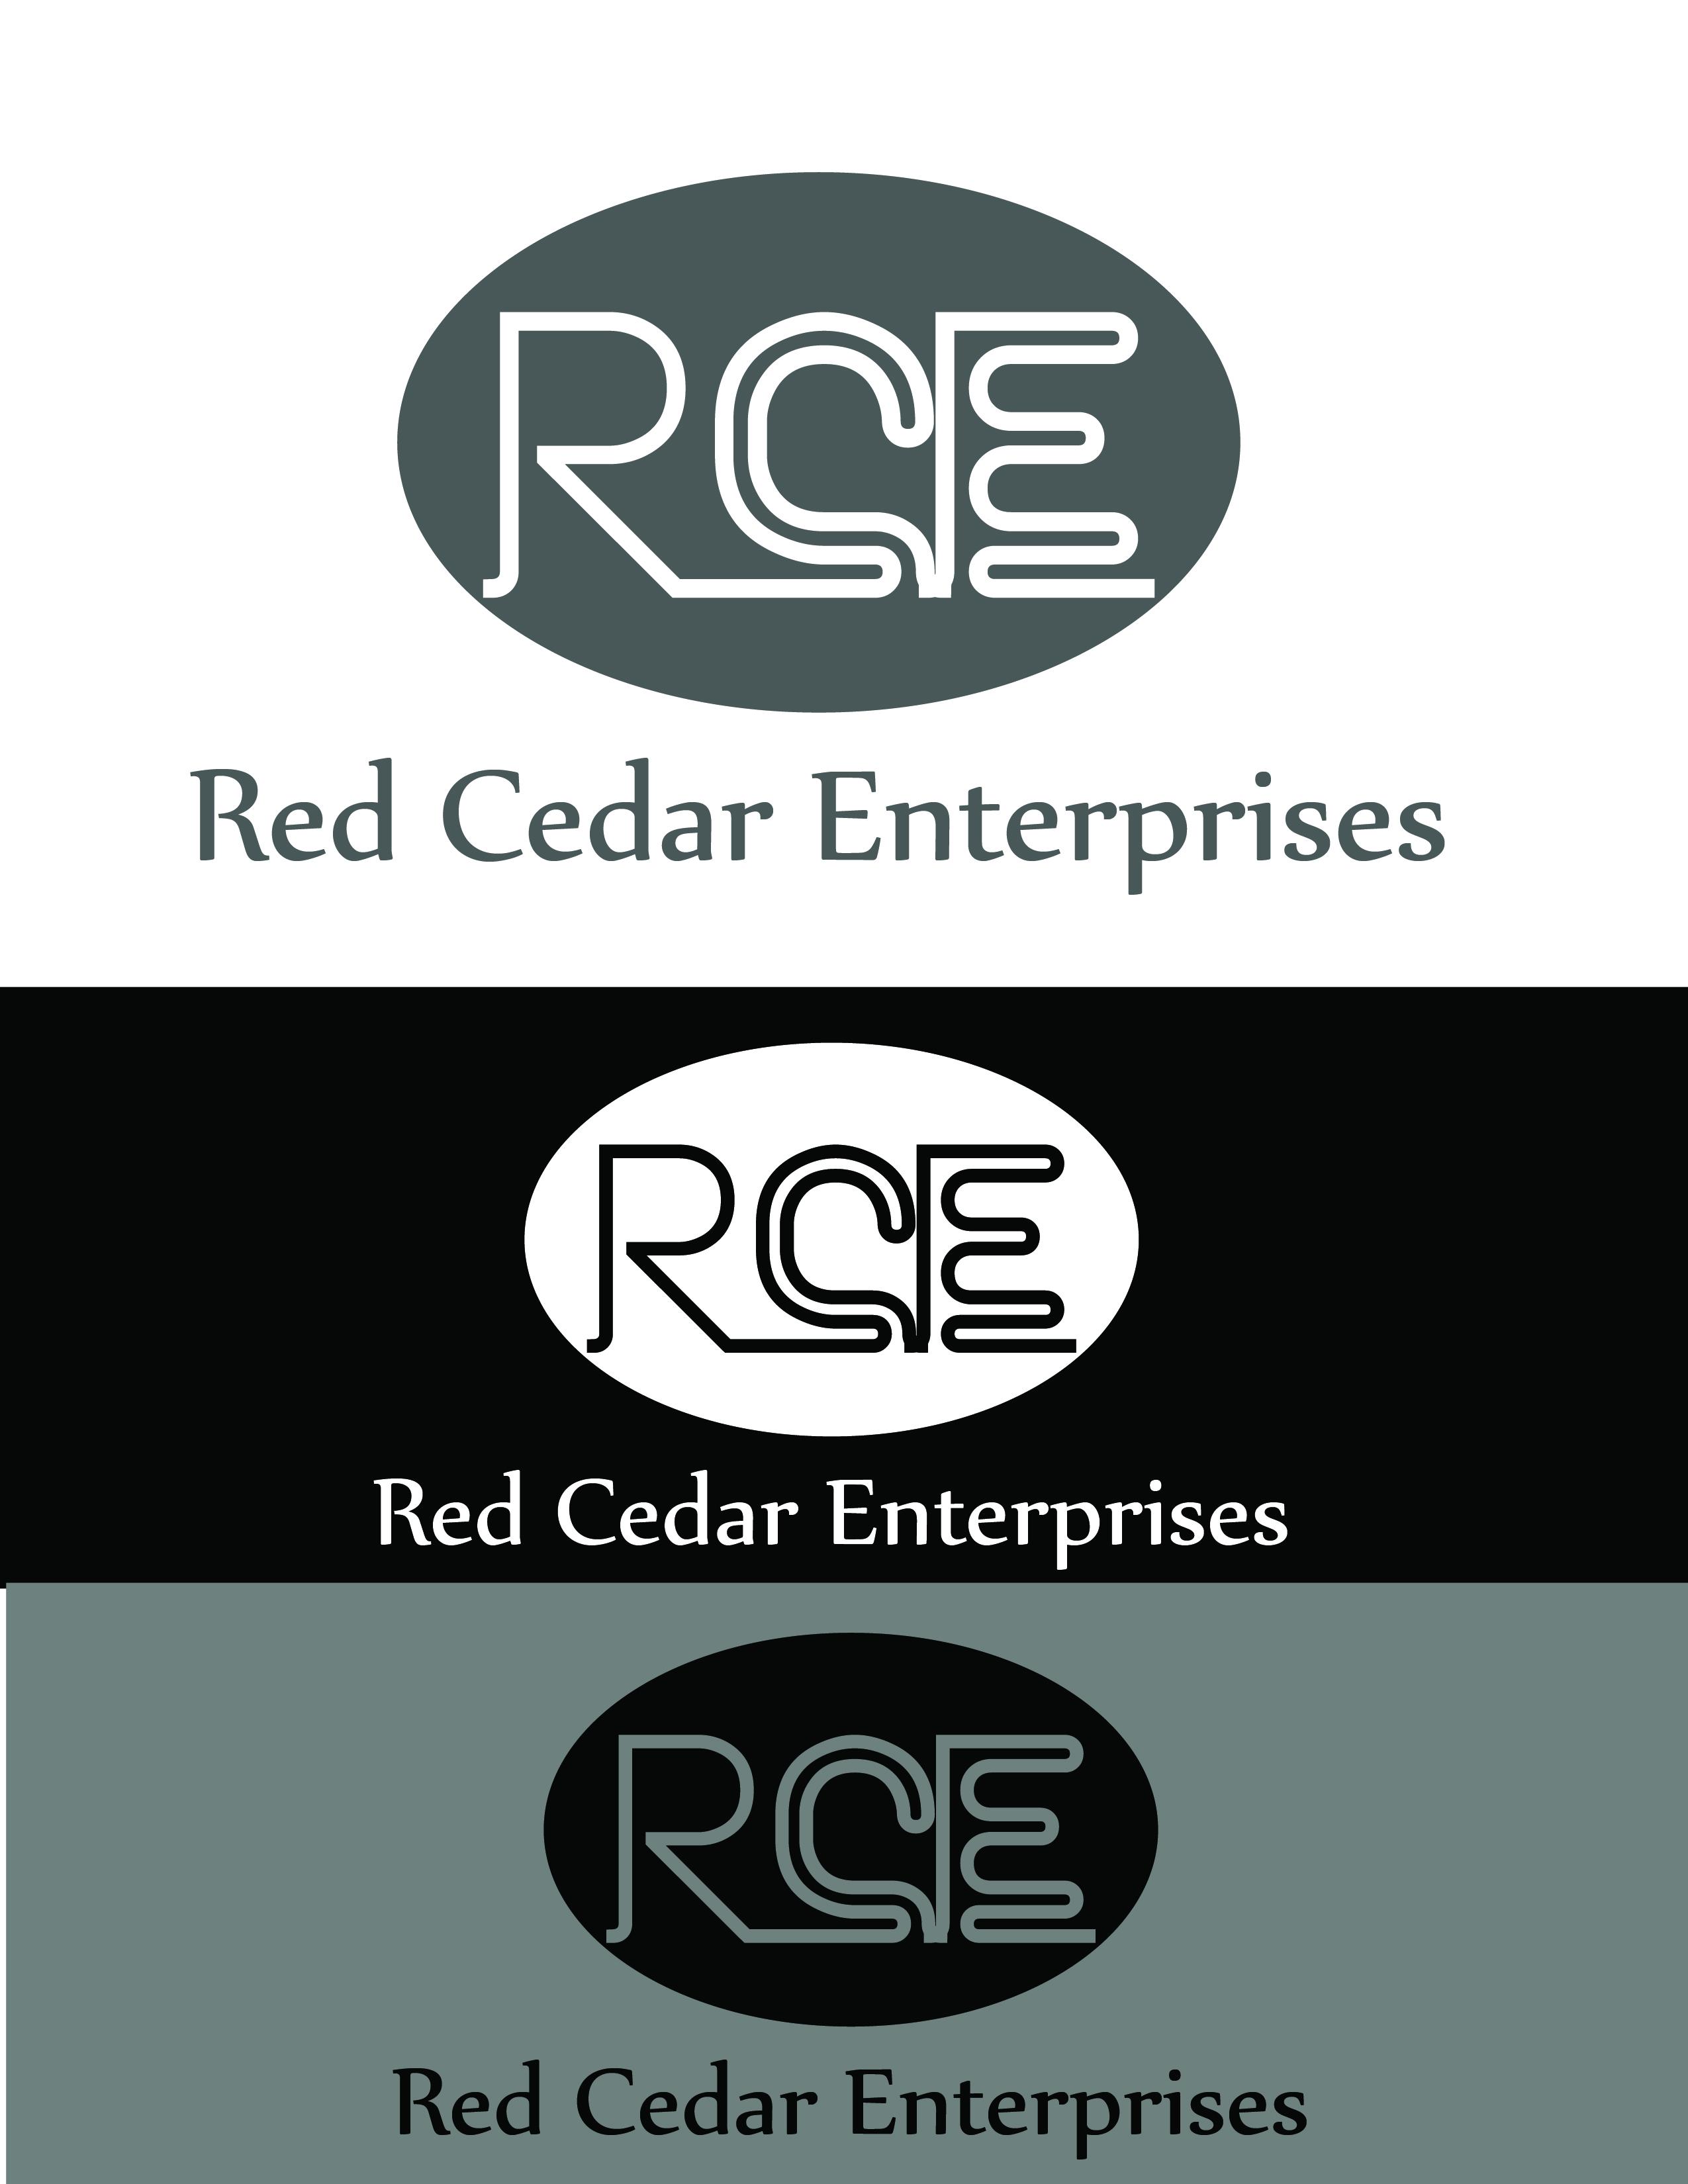 Logo Design by AQIB SHAIKH - Entry No. 78 in the Logo Design Contest Unique Logo Design Wanted for Red Cedar Enterprise.